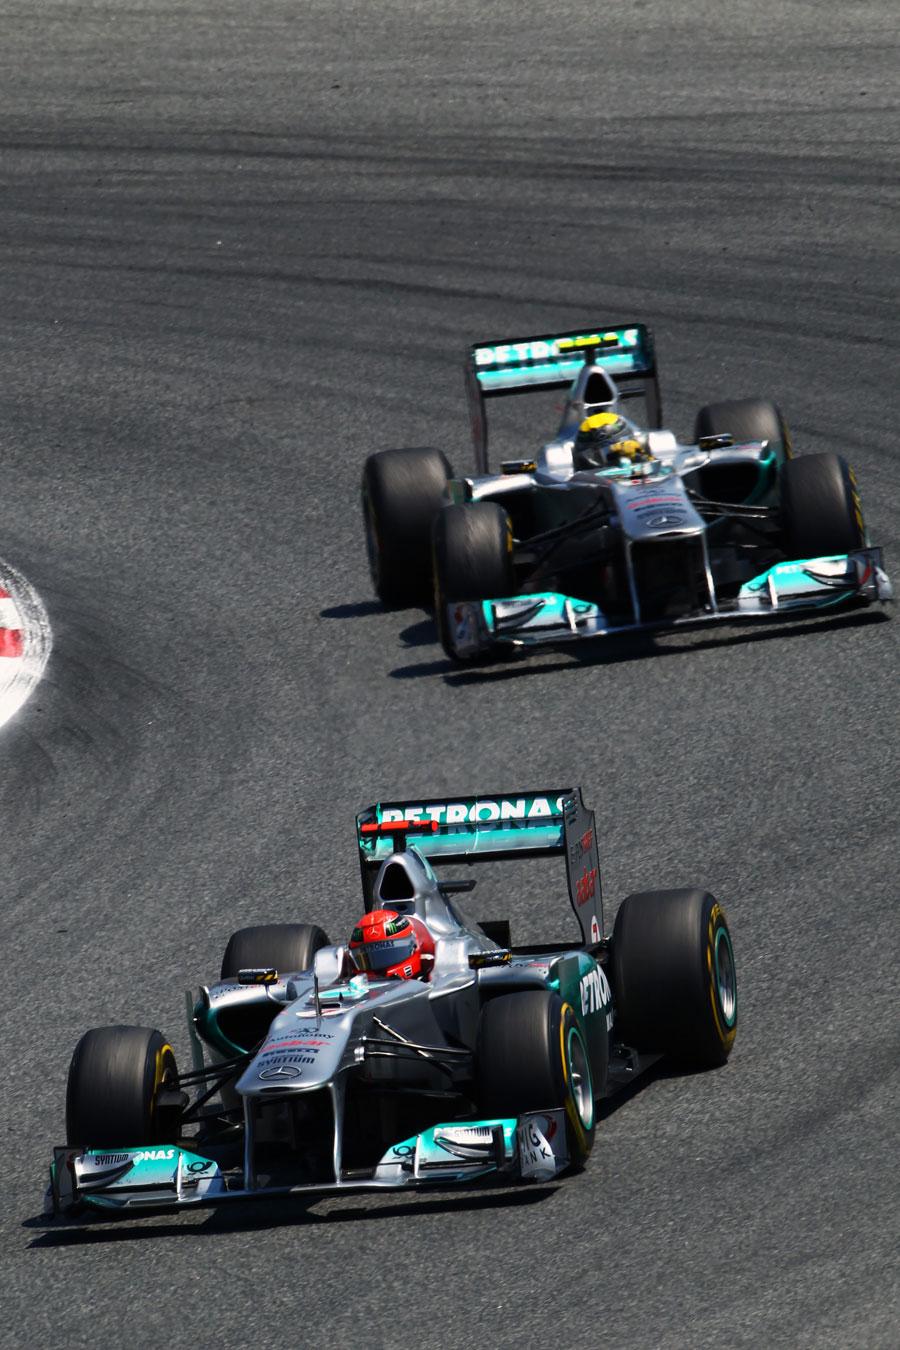 Michael Schumacher leads Nico Rosberg